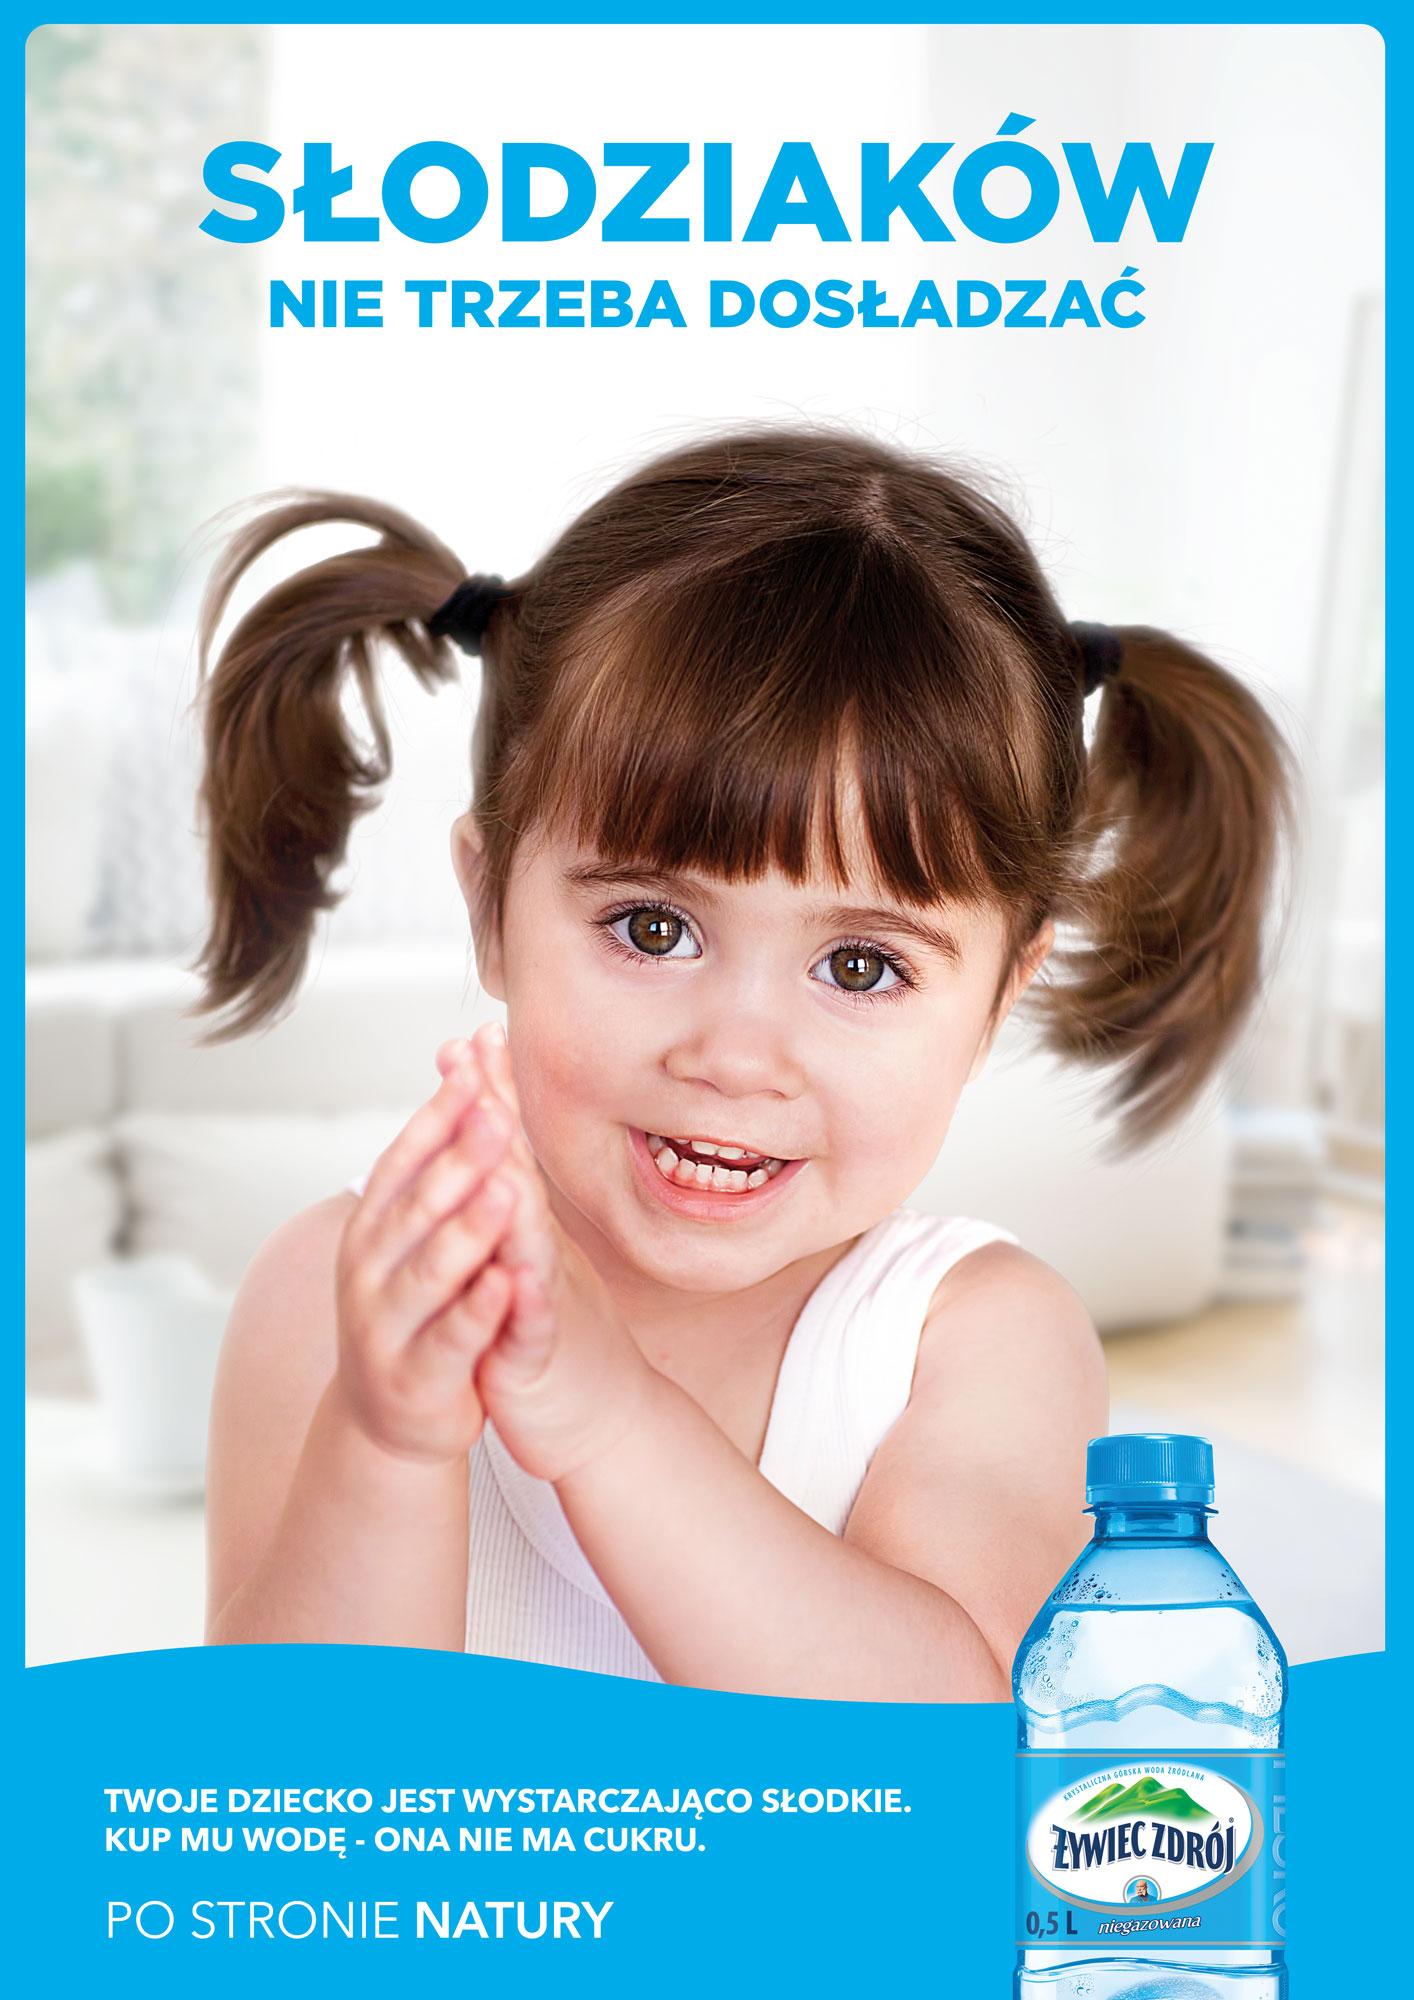 ywiec-Zdrój_VML-Poland